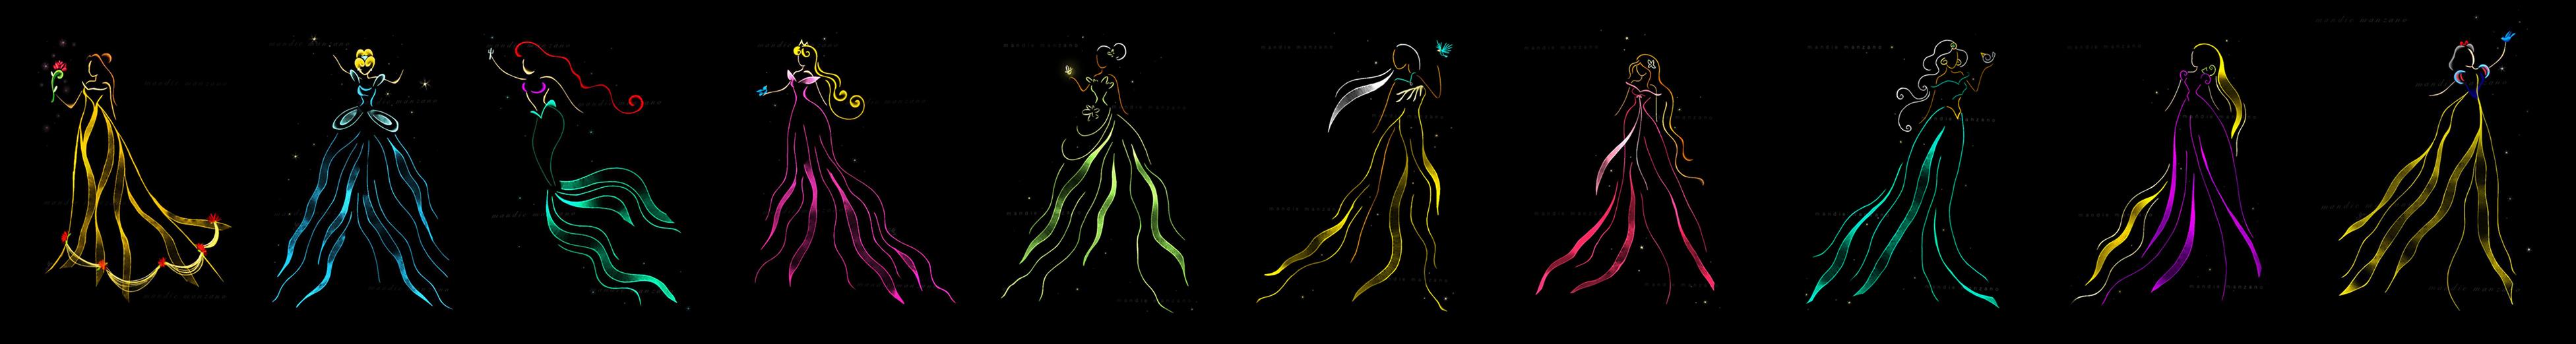 Disney Princesses Ribbon Art by mandiemanzano